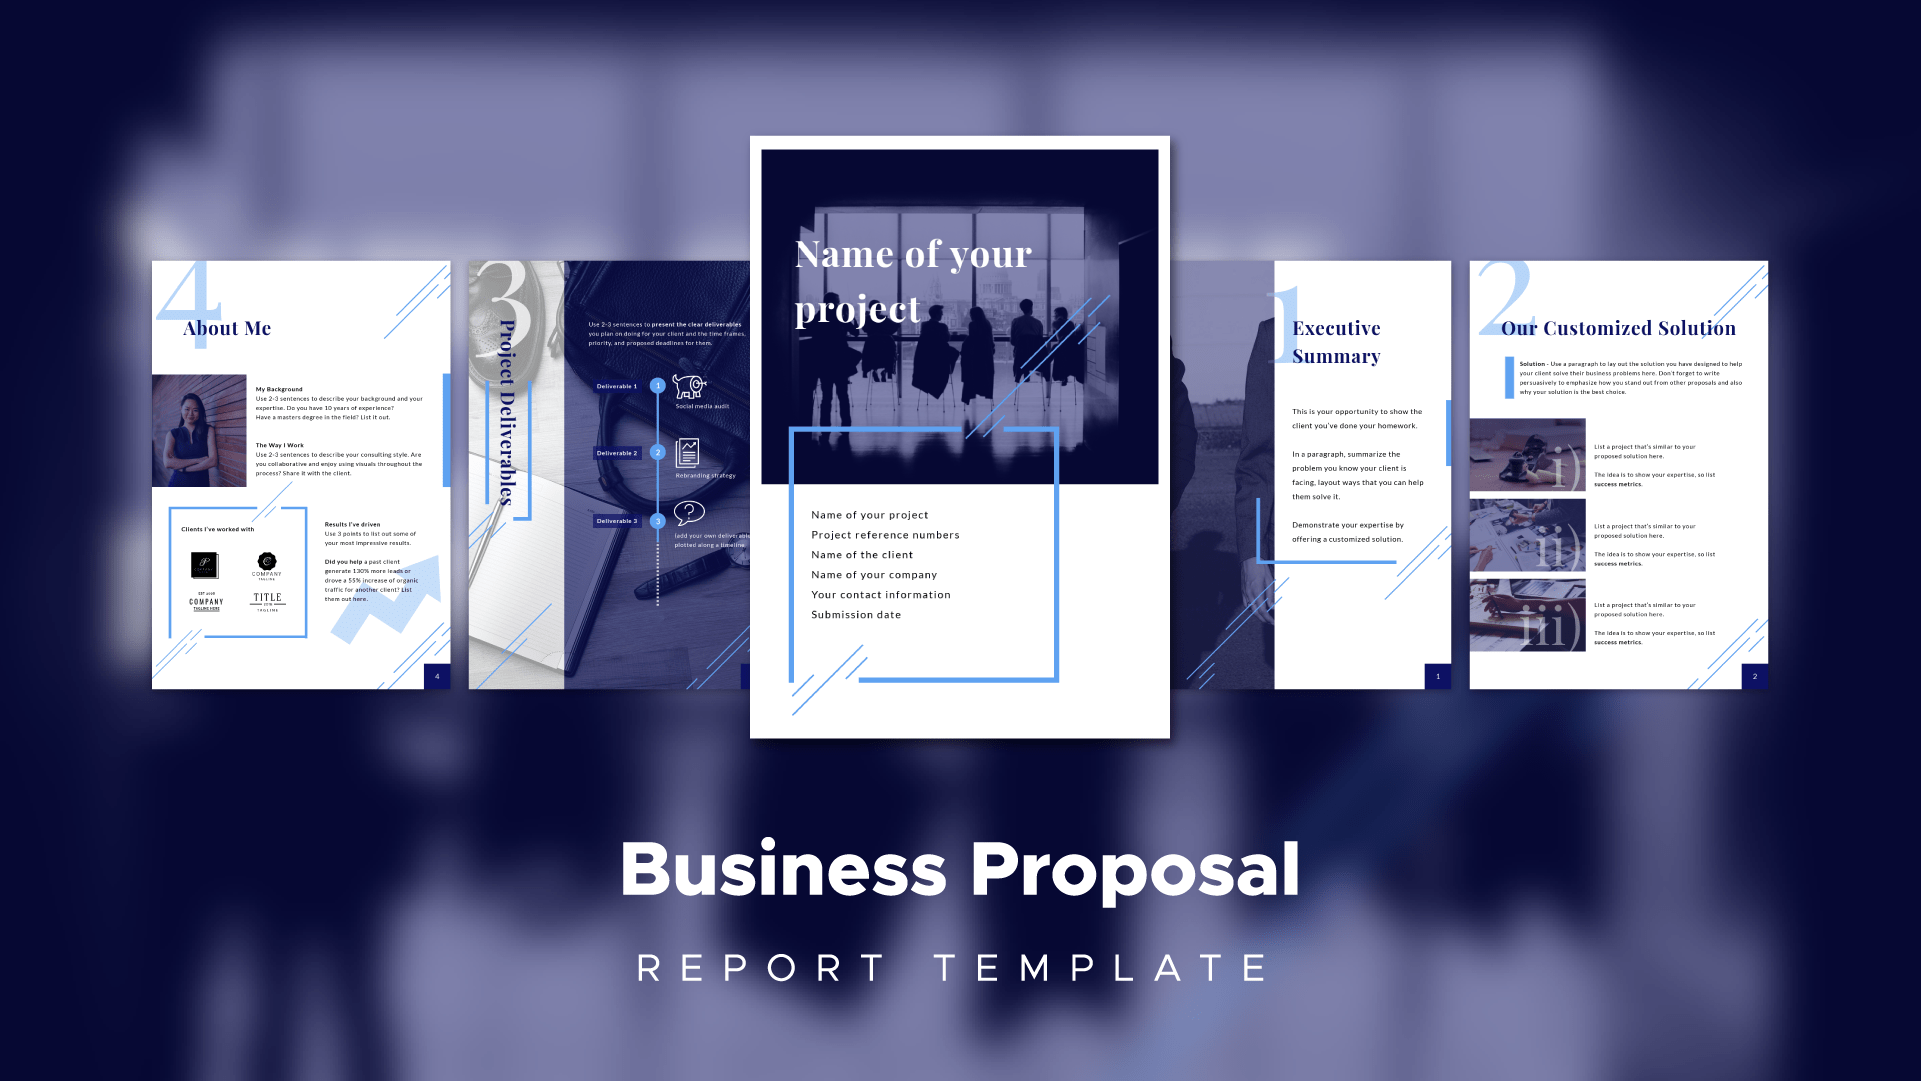 templates-visual_report_1165-2393743